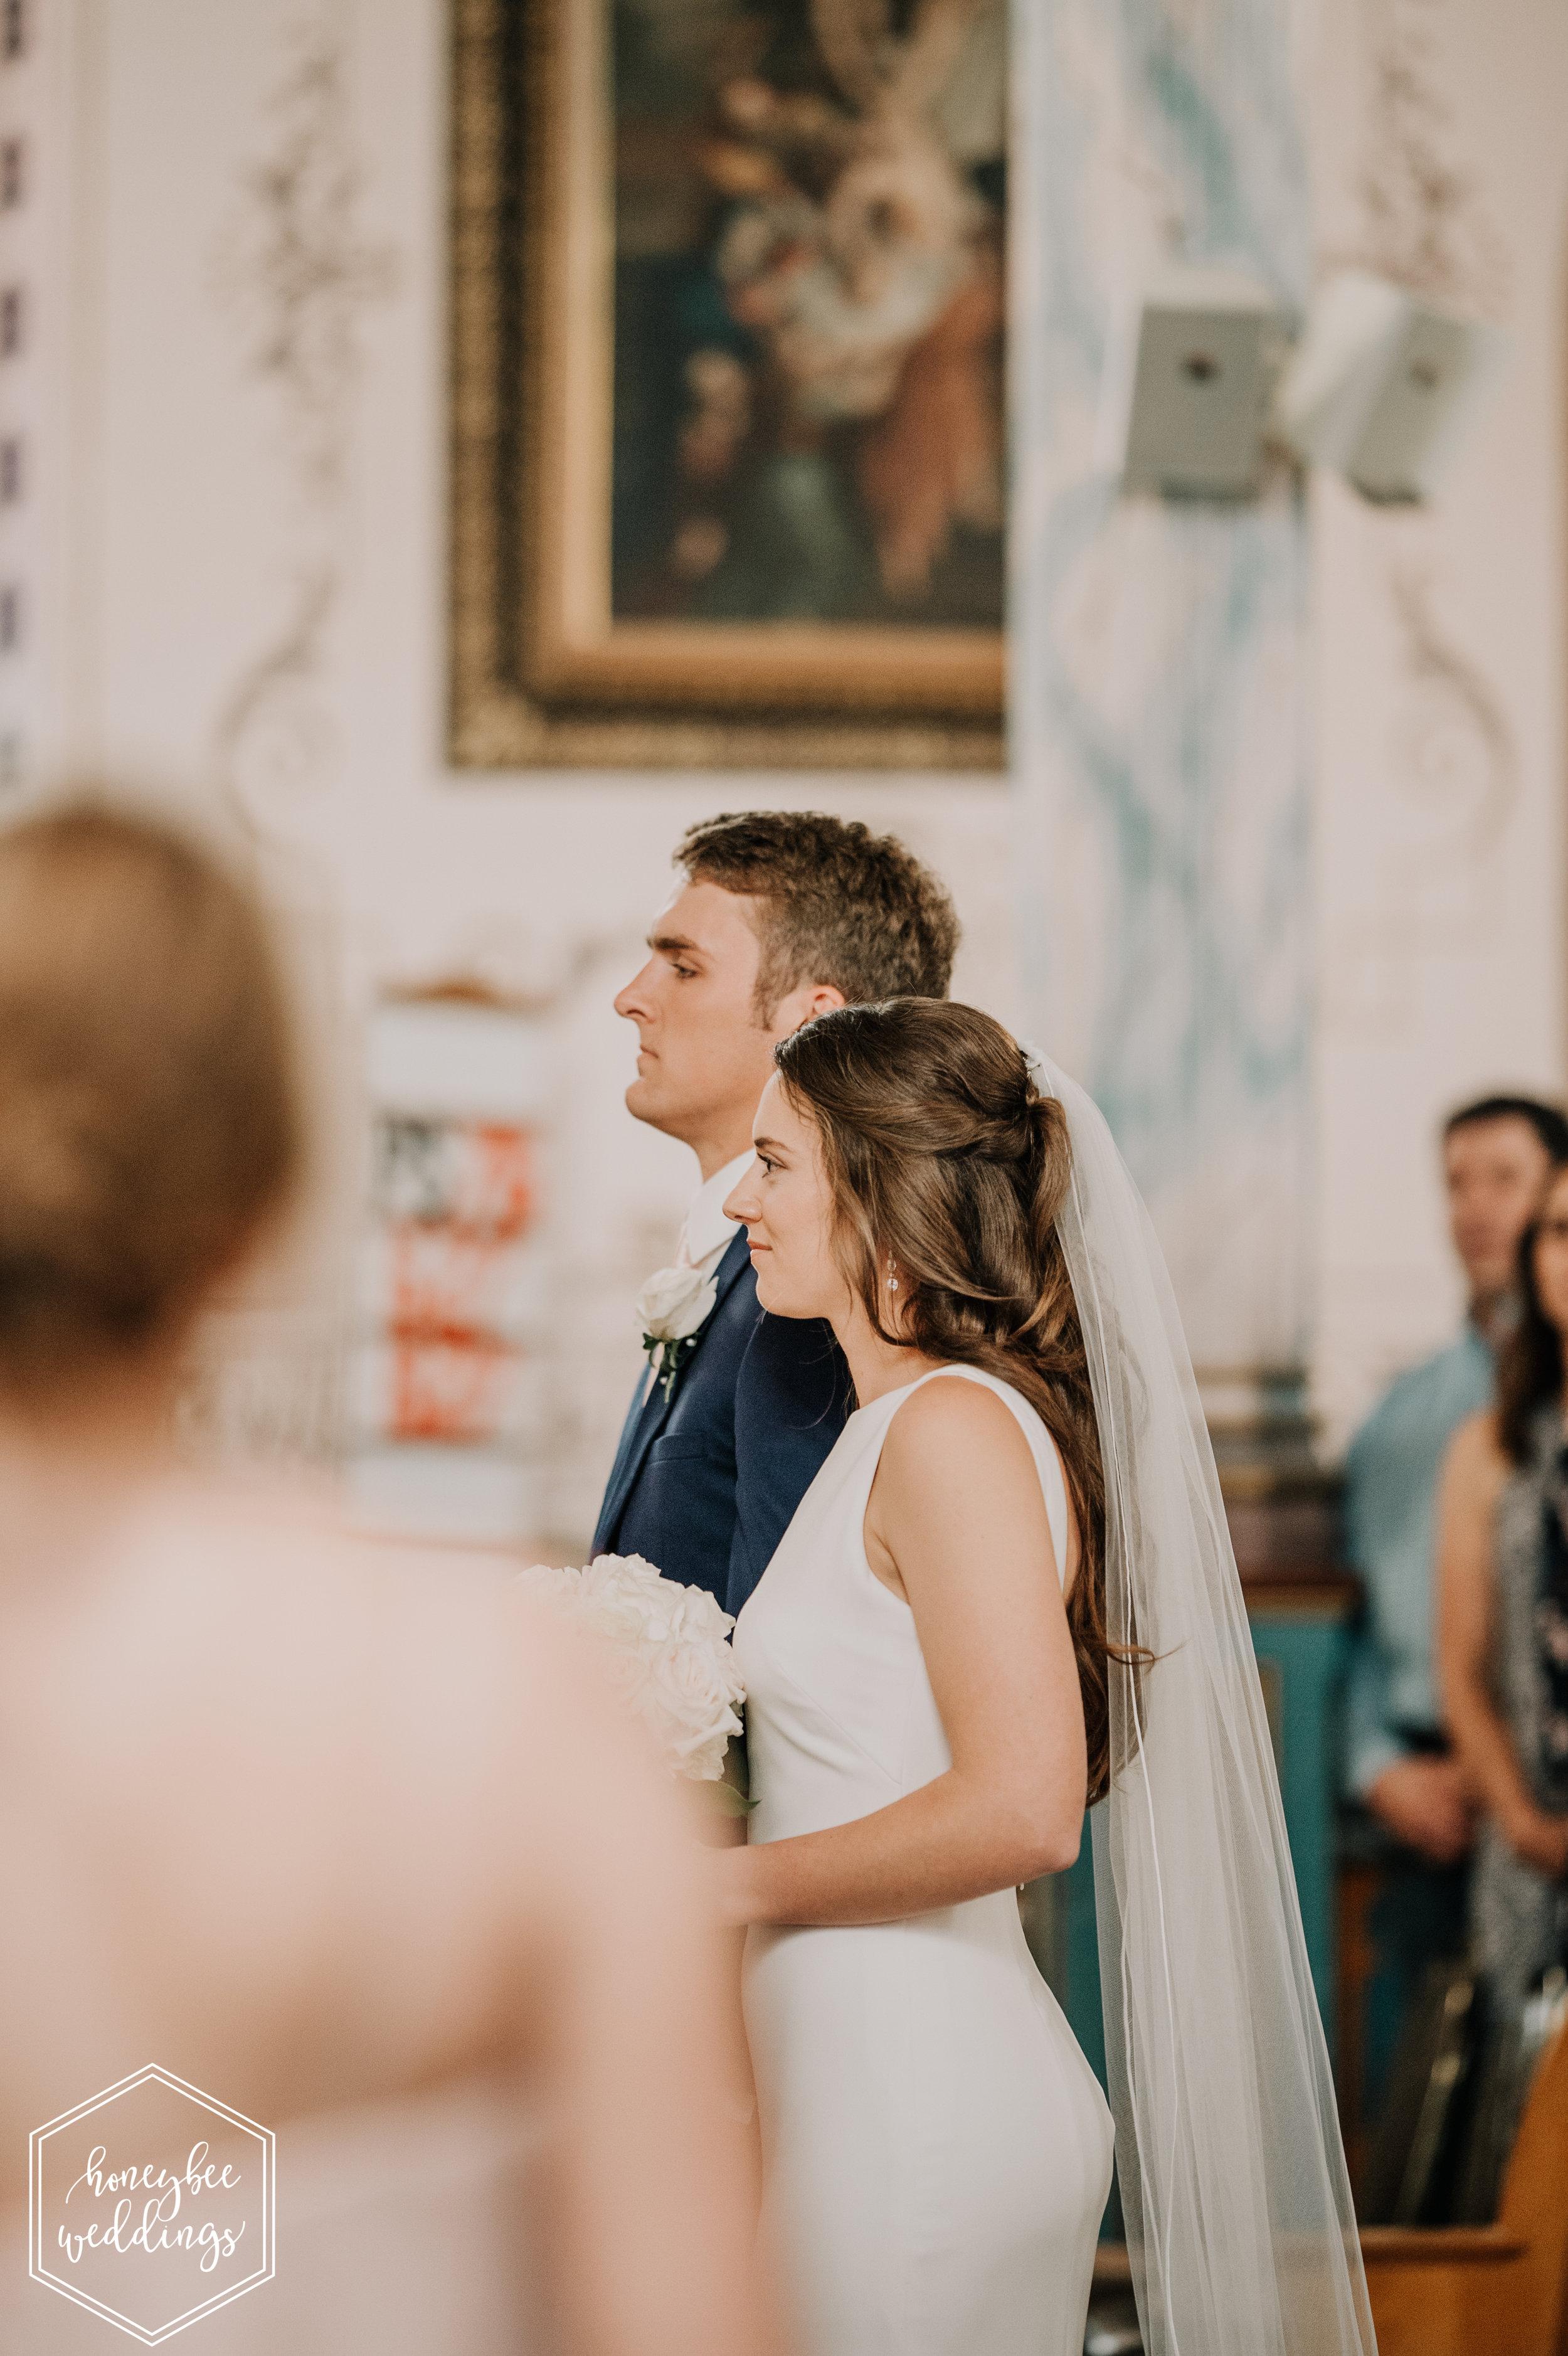 96 Montana Wedding Photographer_St. Francis Wedding_Tifani Zanto + Ryan Burke -5721-2.jpg